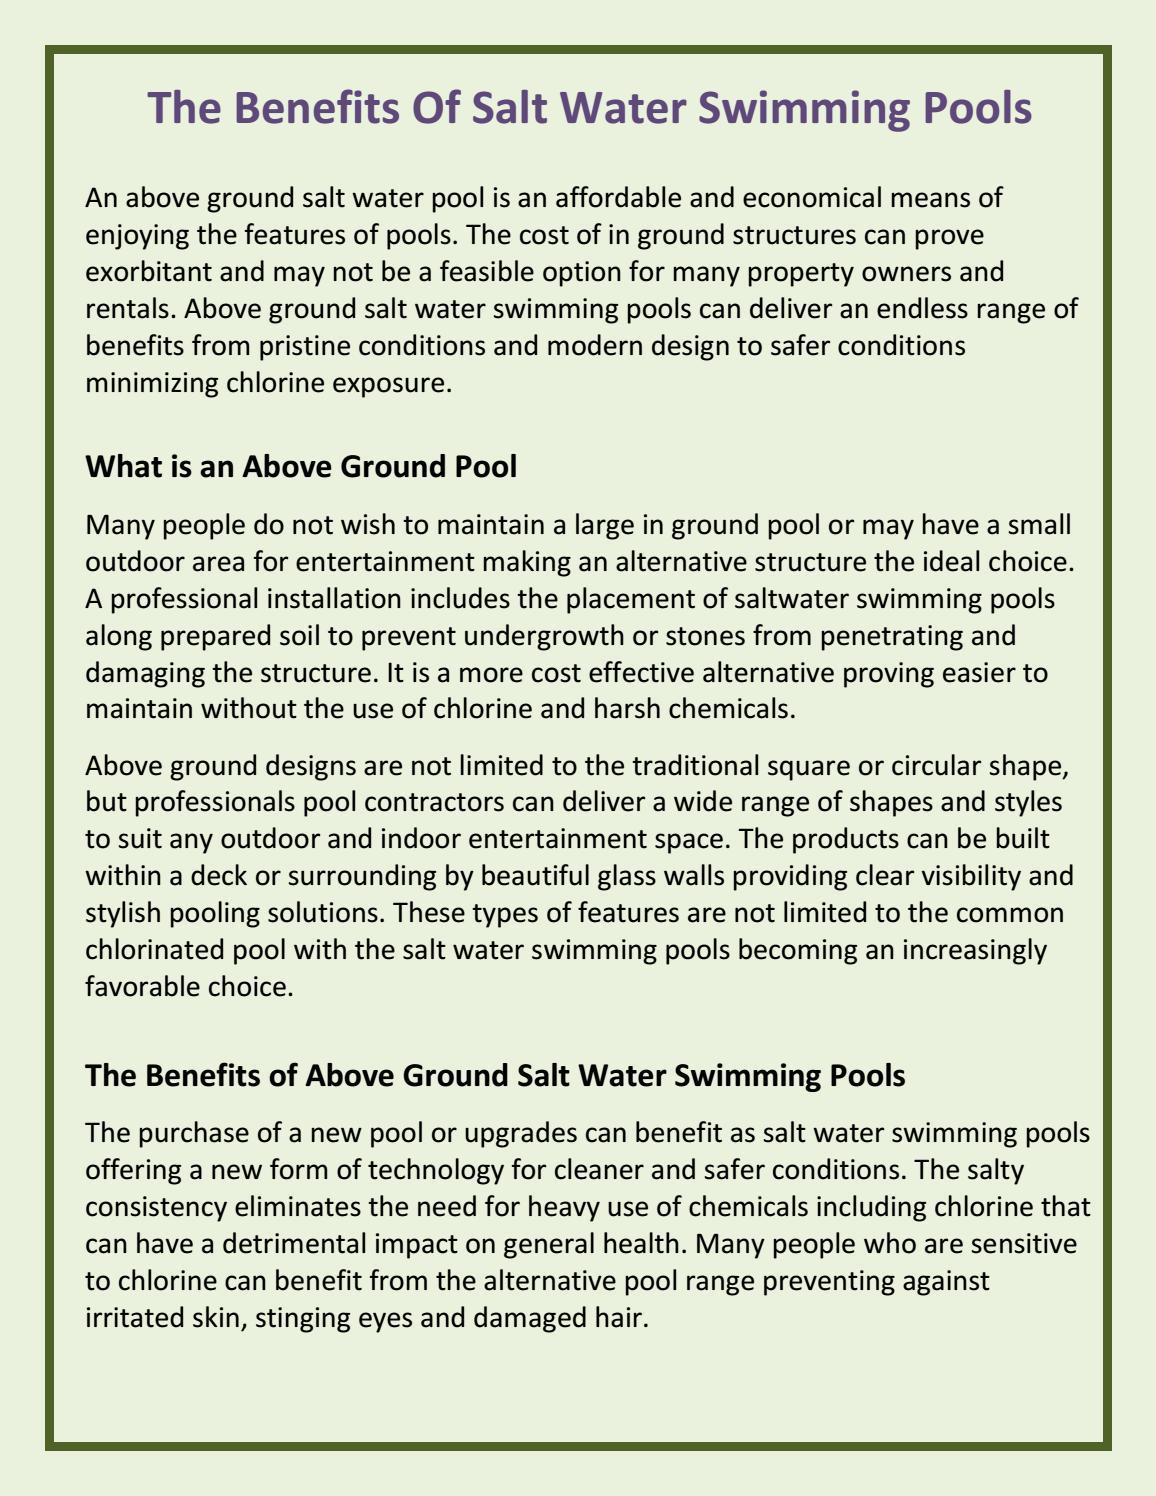 The Benefits Of Salt Water Swimming Pools by RileyGwynne - issuu